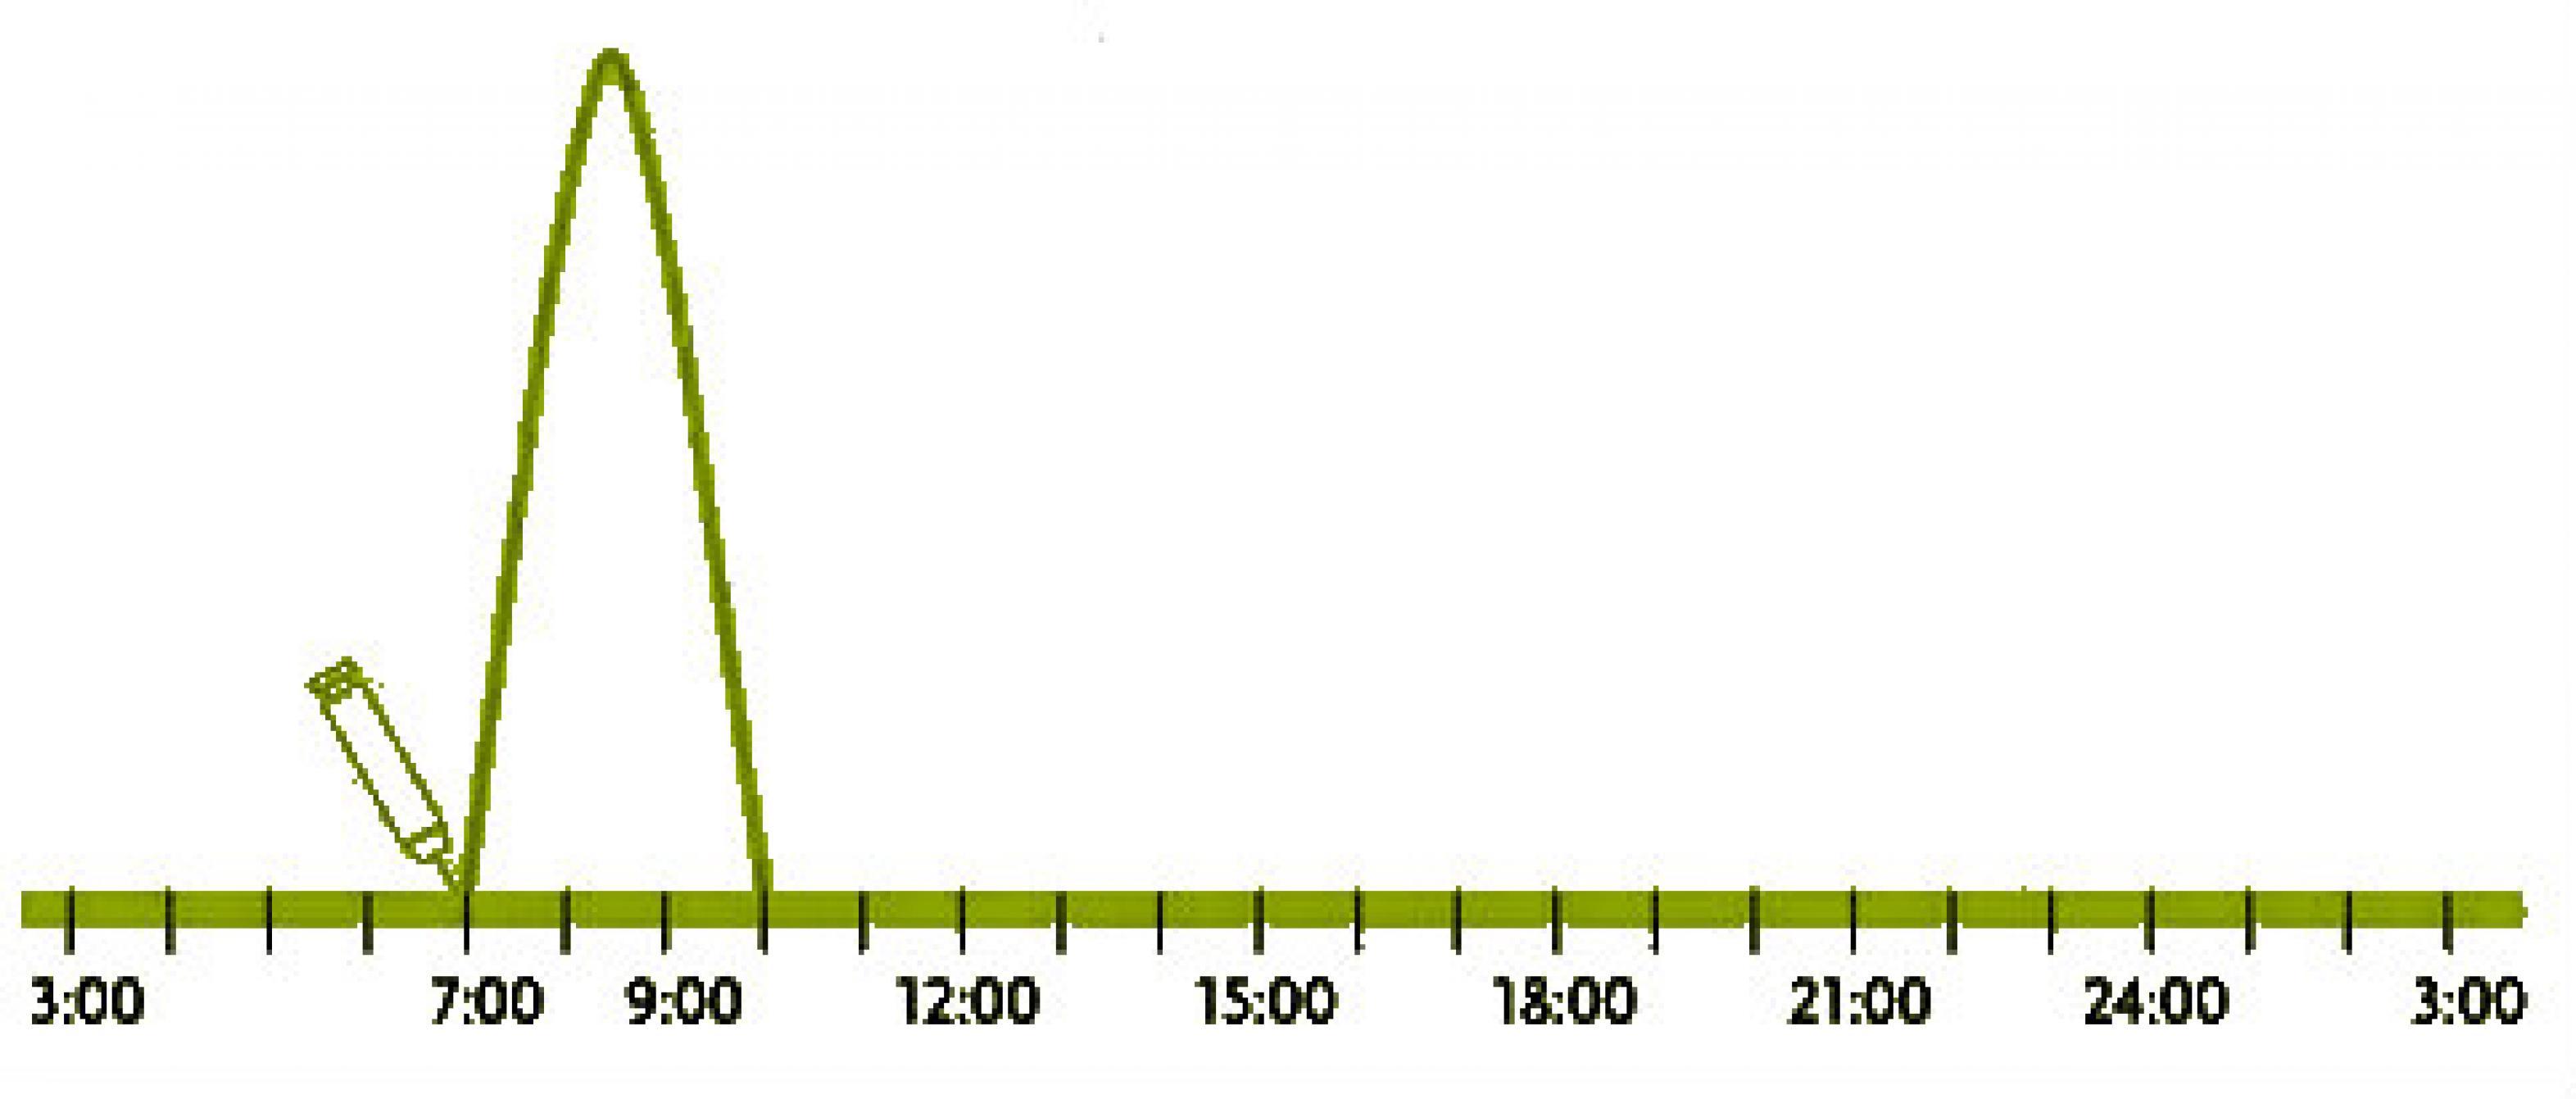 Grafik Kurve Kurzwirksame Anlaog Insuline Adipra